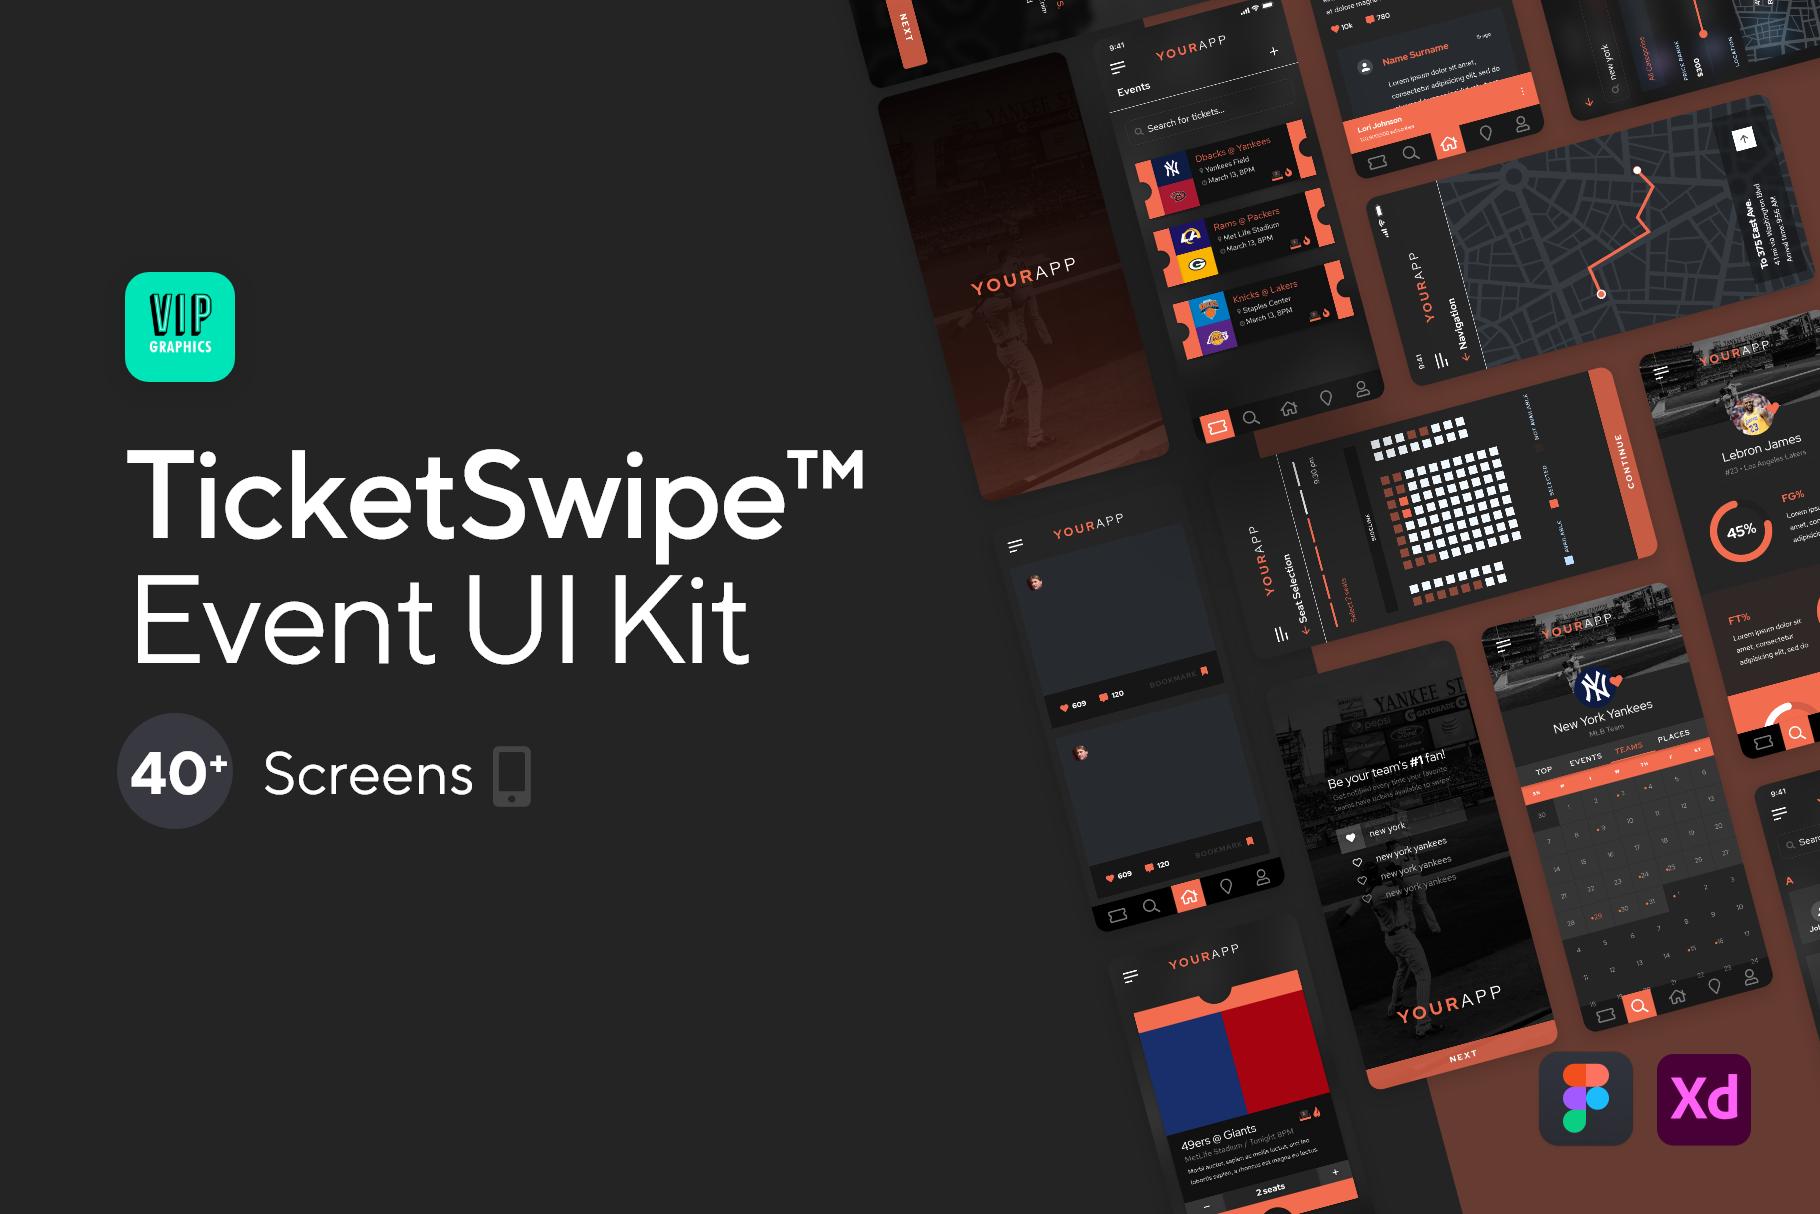 Ticket Swipe™ : Event Discovery Mobile App UI Kit | VIP.graphics